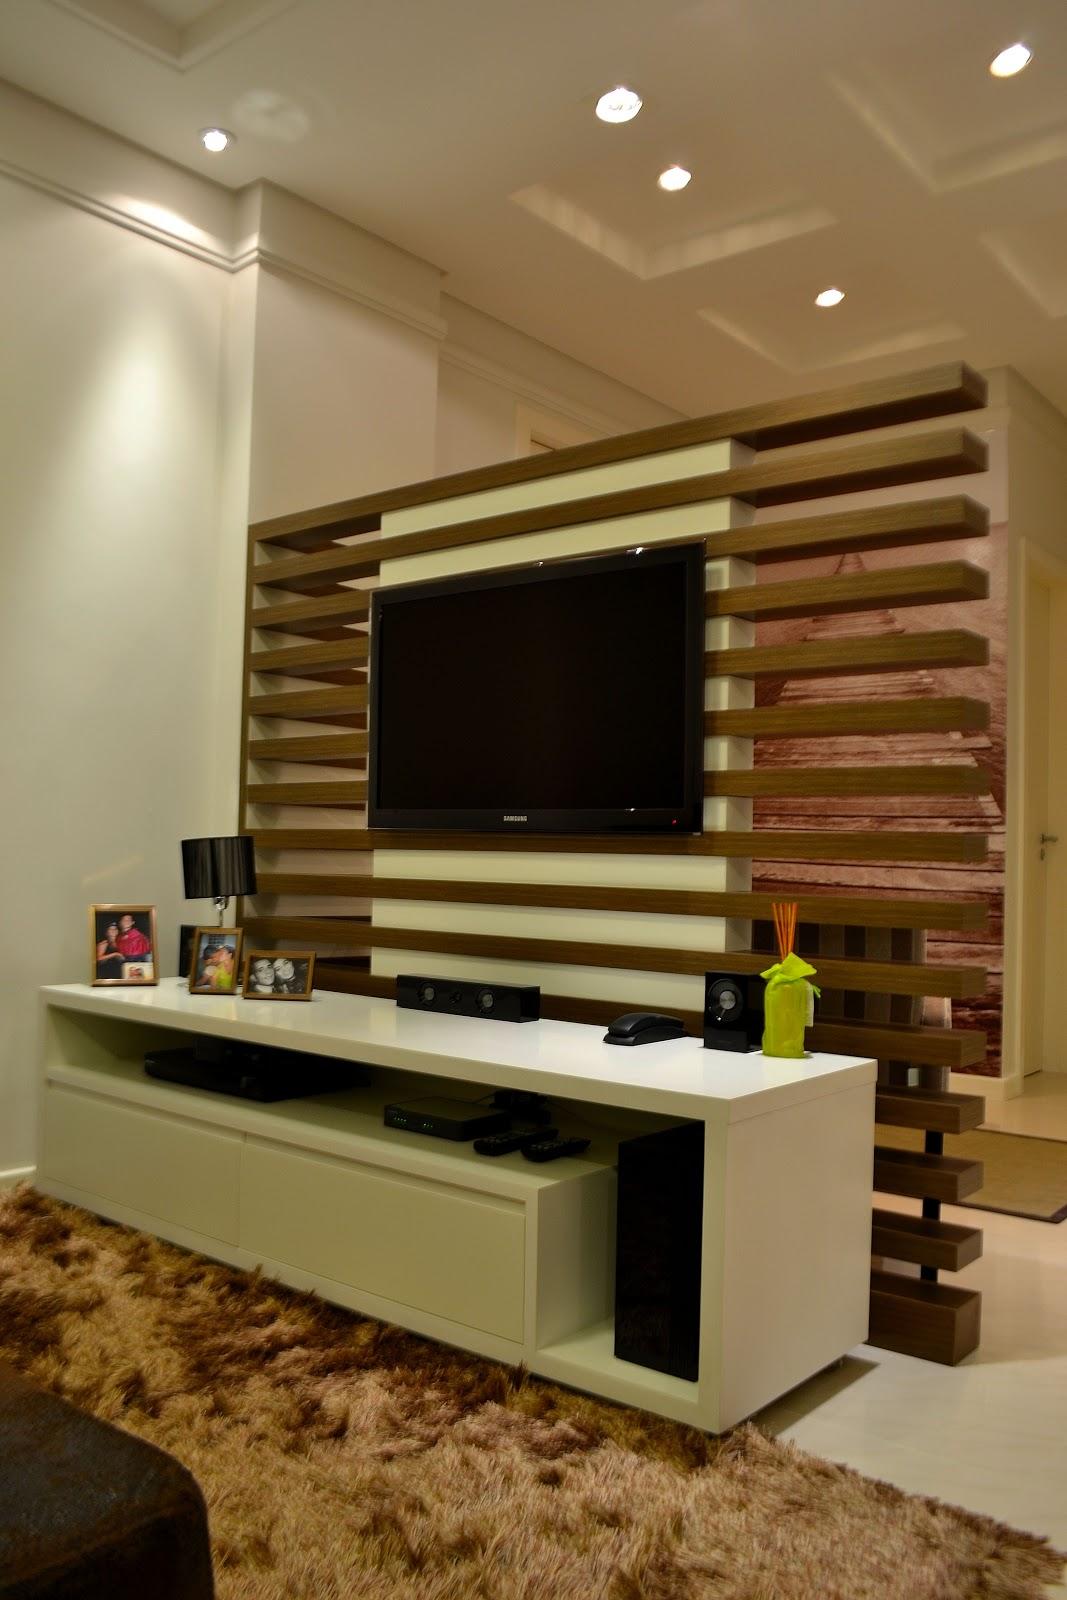 roberto moreira o conceito de integrar. Black Bedroom Furniture Sets. Home Design Ideas